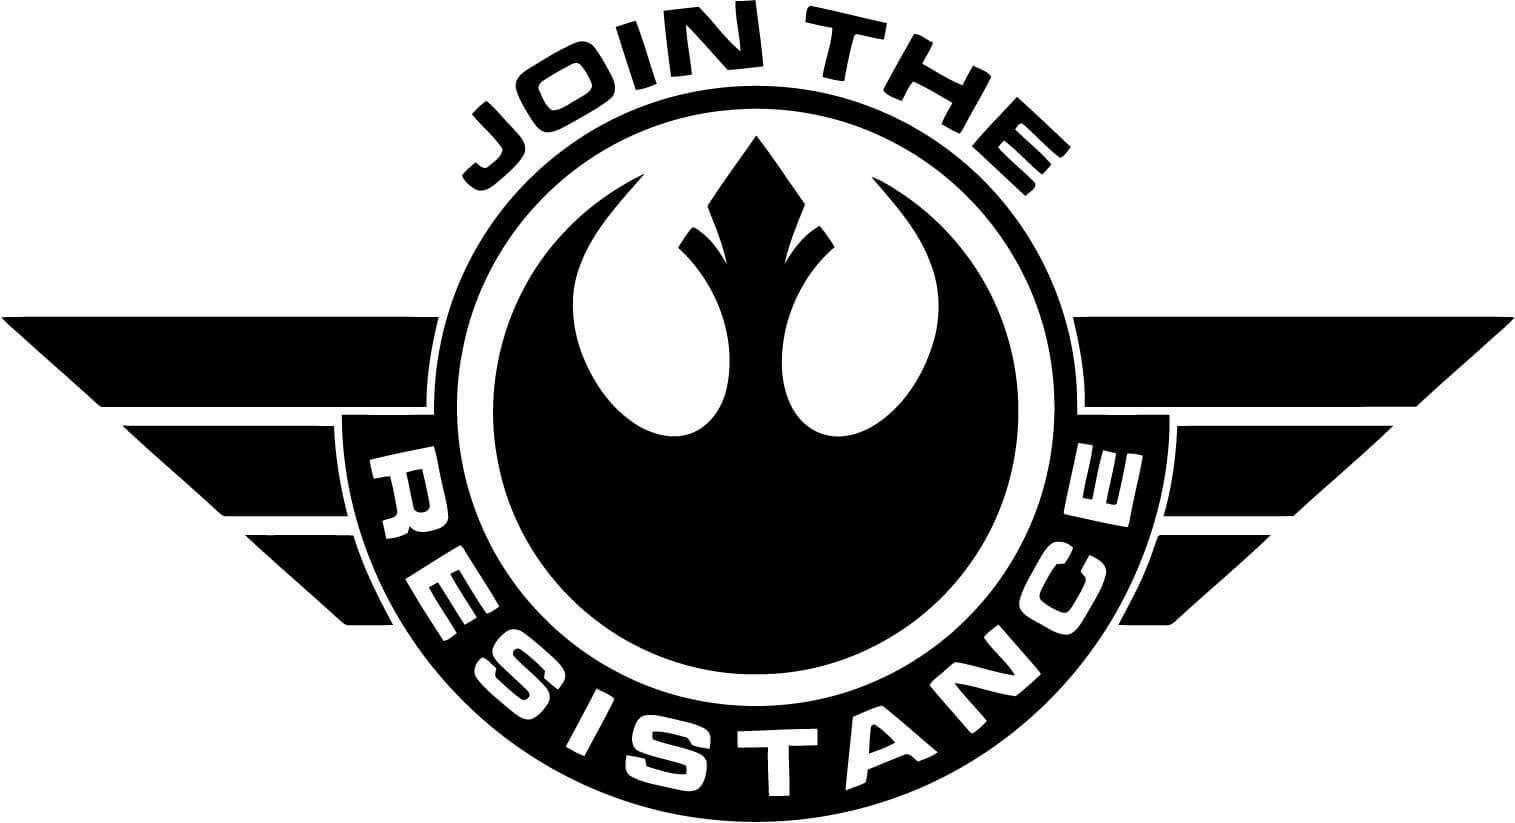 Star Wars Join The Resistance Badge Vinyl Car Window And Laptop Decal Sticker Starwarstattoo Star Wars Stencil Star Wars Stickers Star Wars Decal [ 823 x 1515 Pixel ]